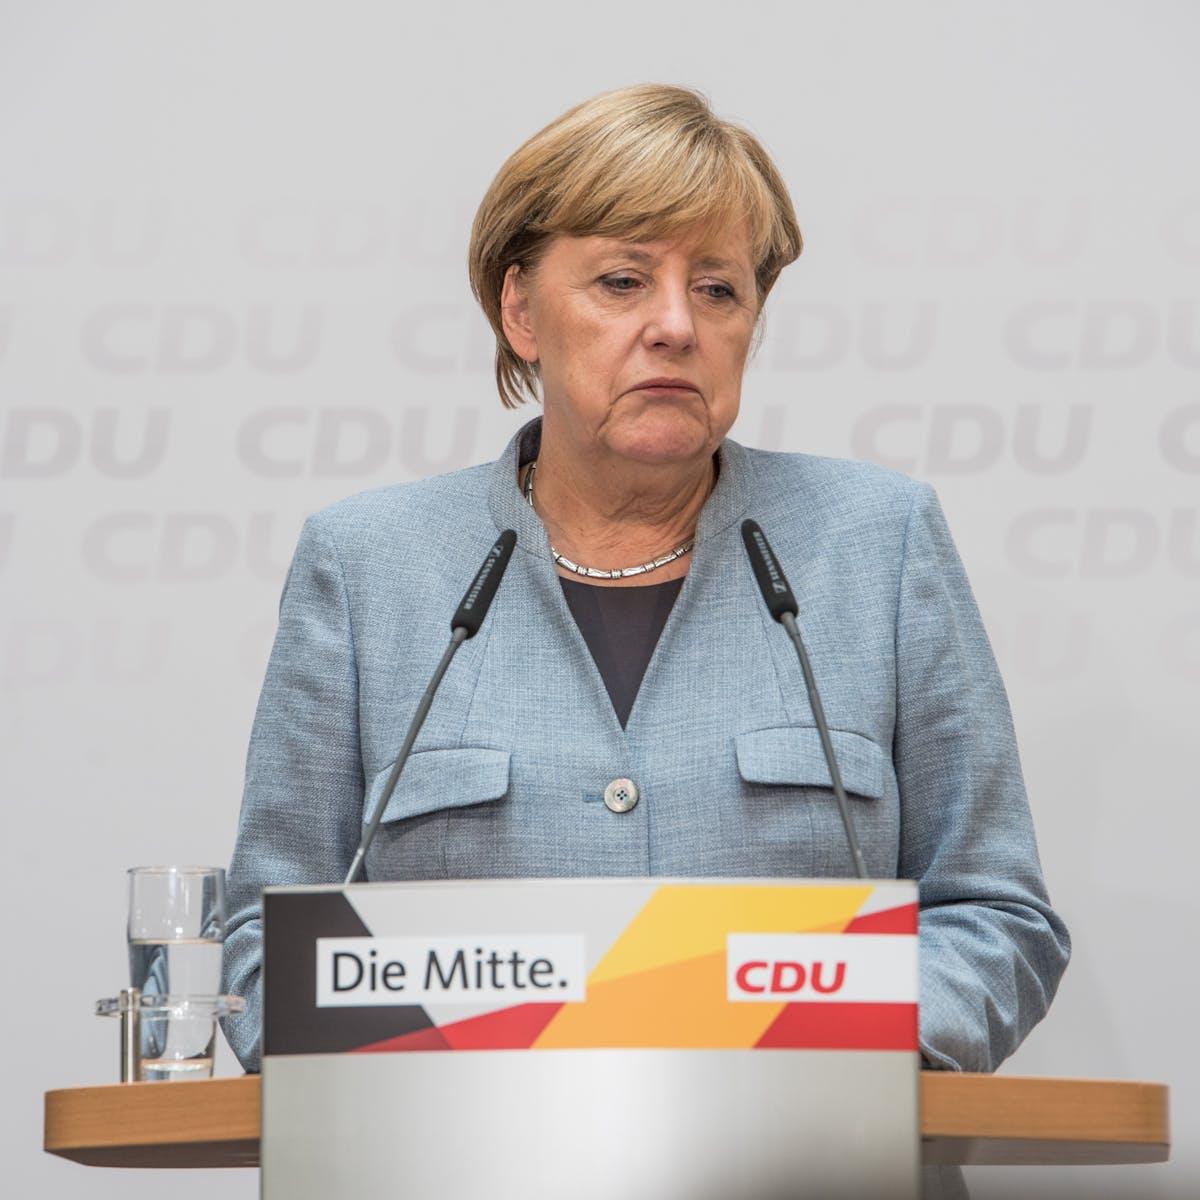 Titelbild-Angela-Merkel-CDU-Digital-Gipfel-pixabay-3464284-Berlinerfotograf